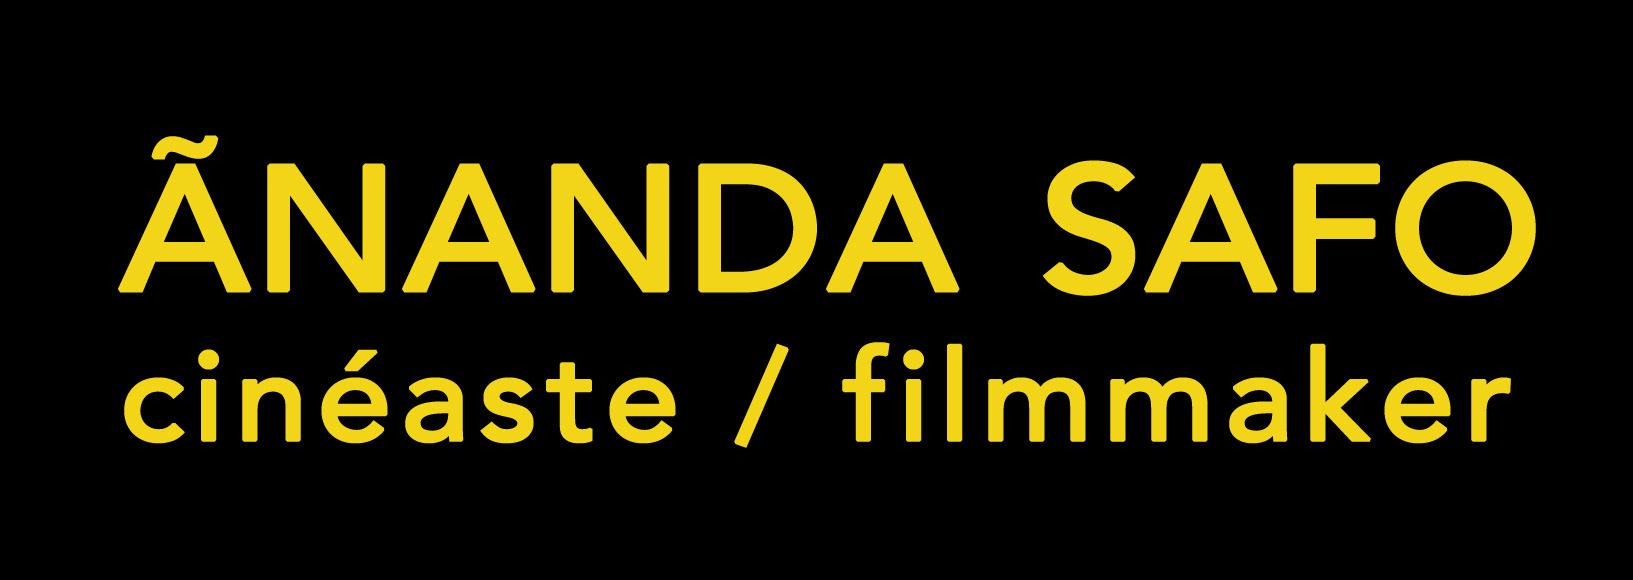 Ãnanda Safo